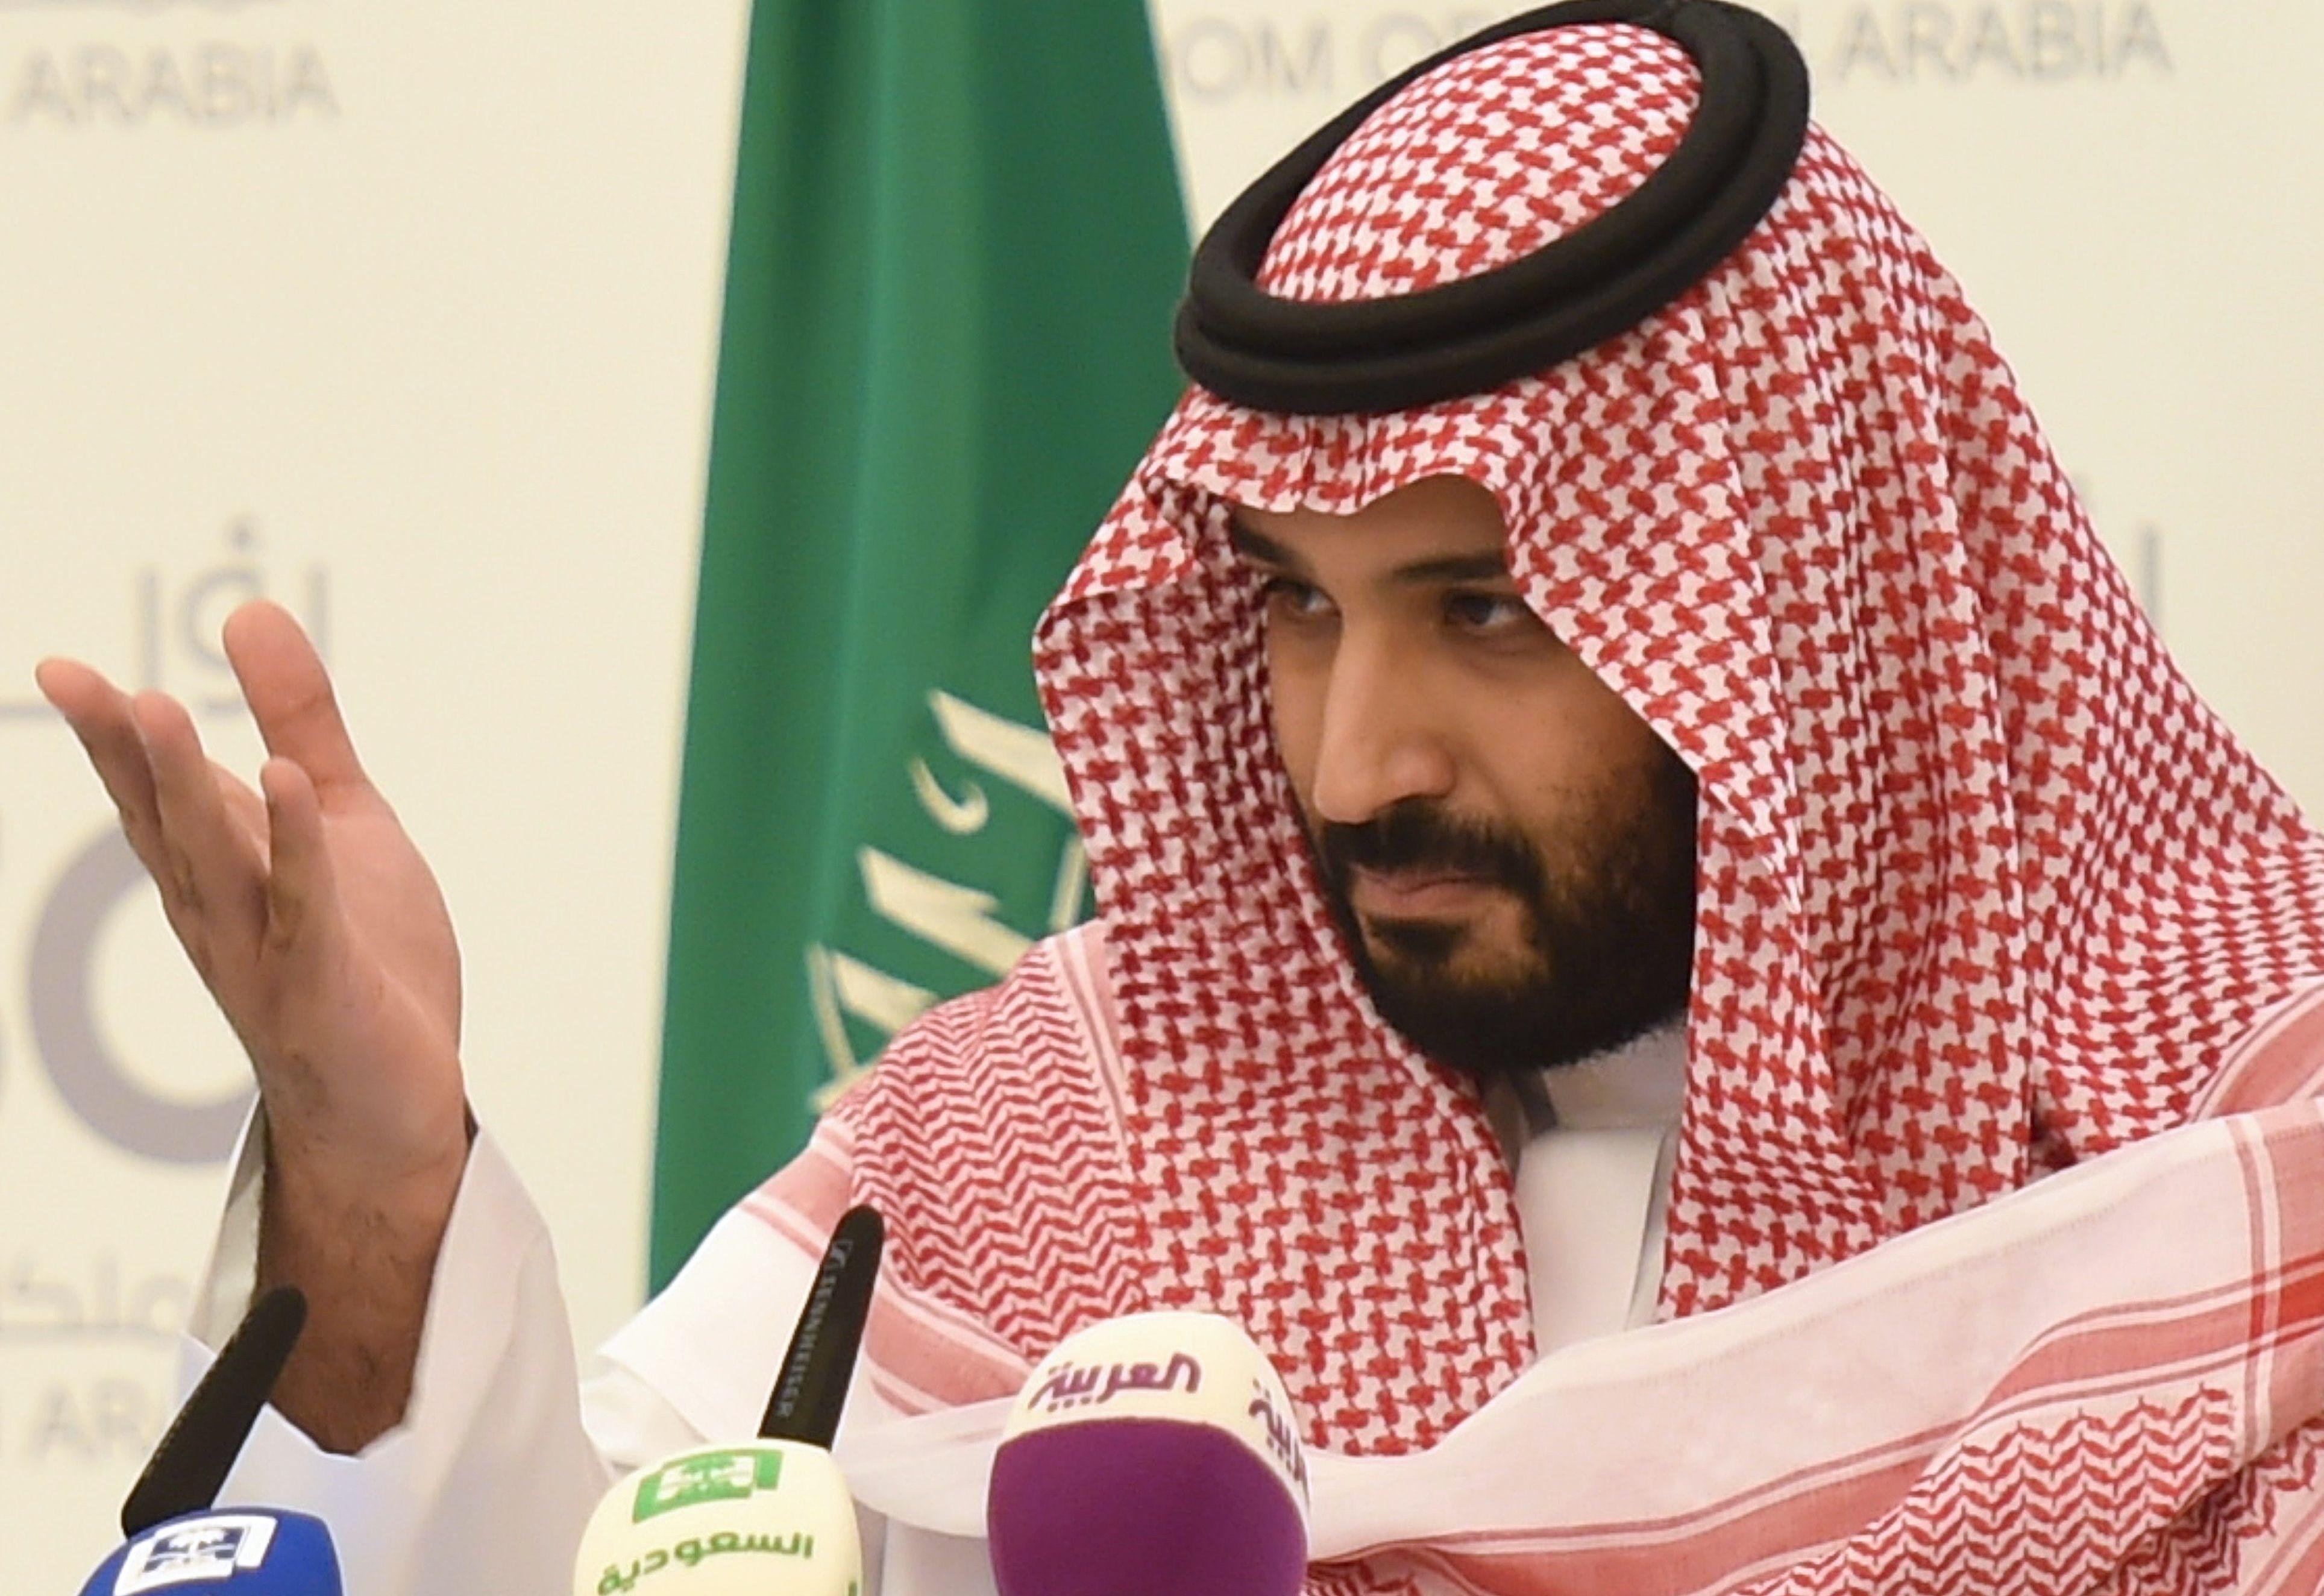 Saudi Arabia's bold vision for economic diversification